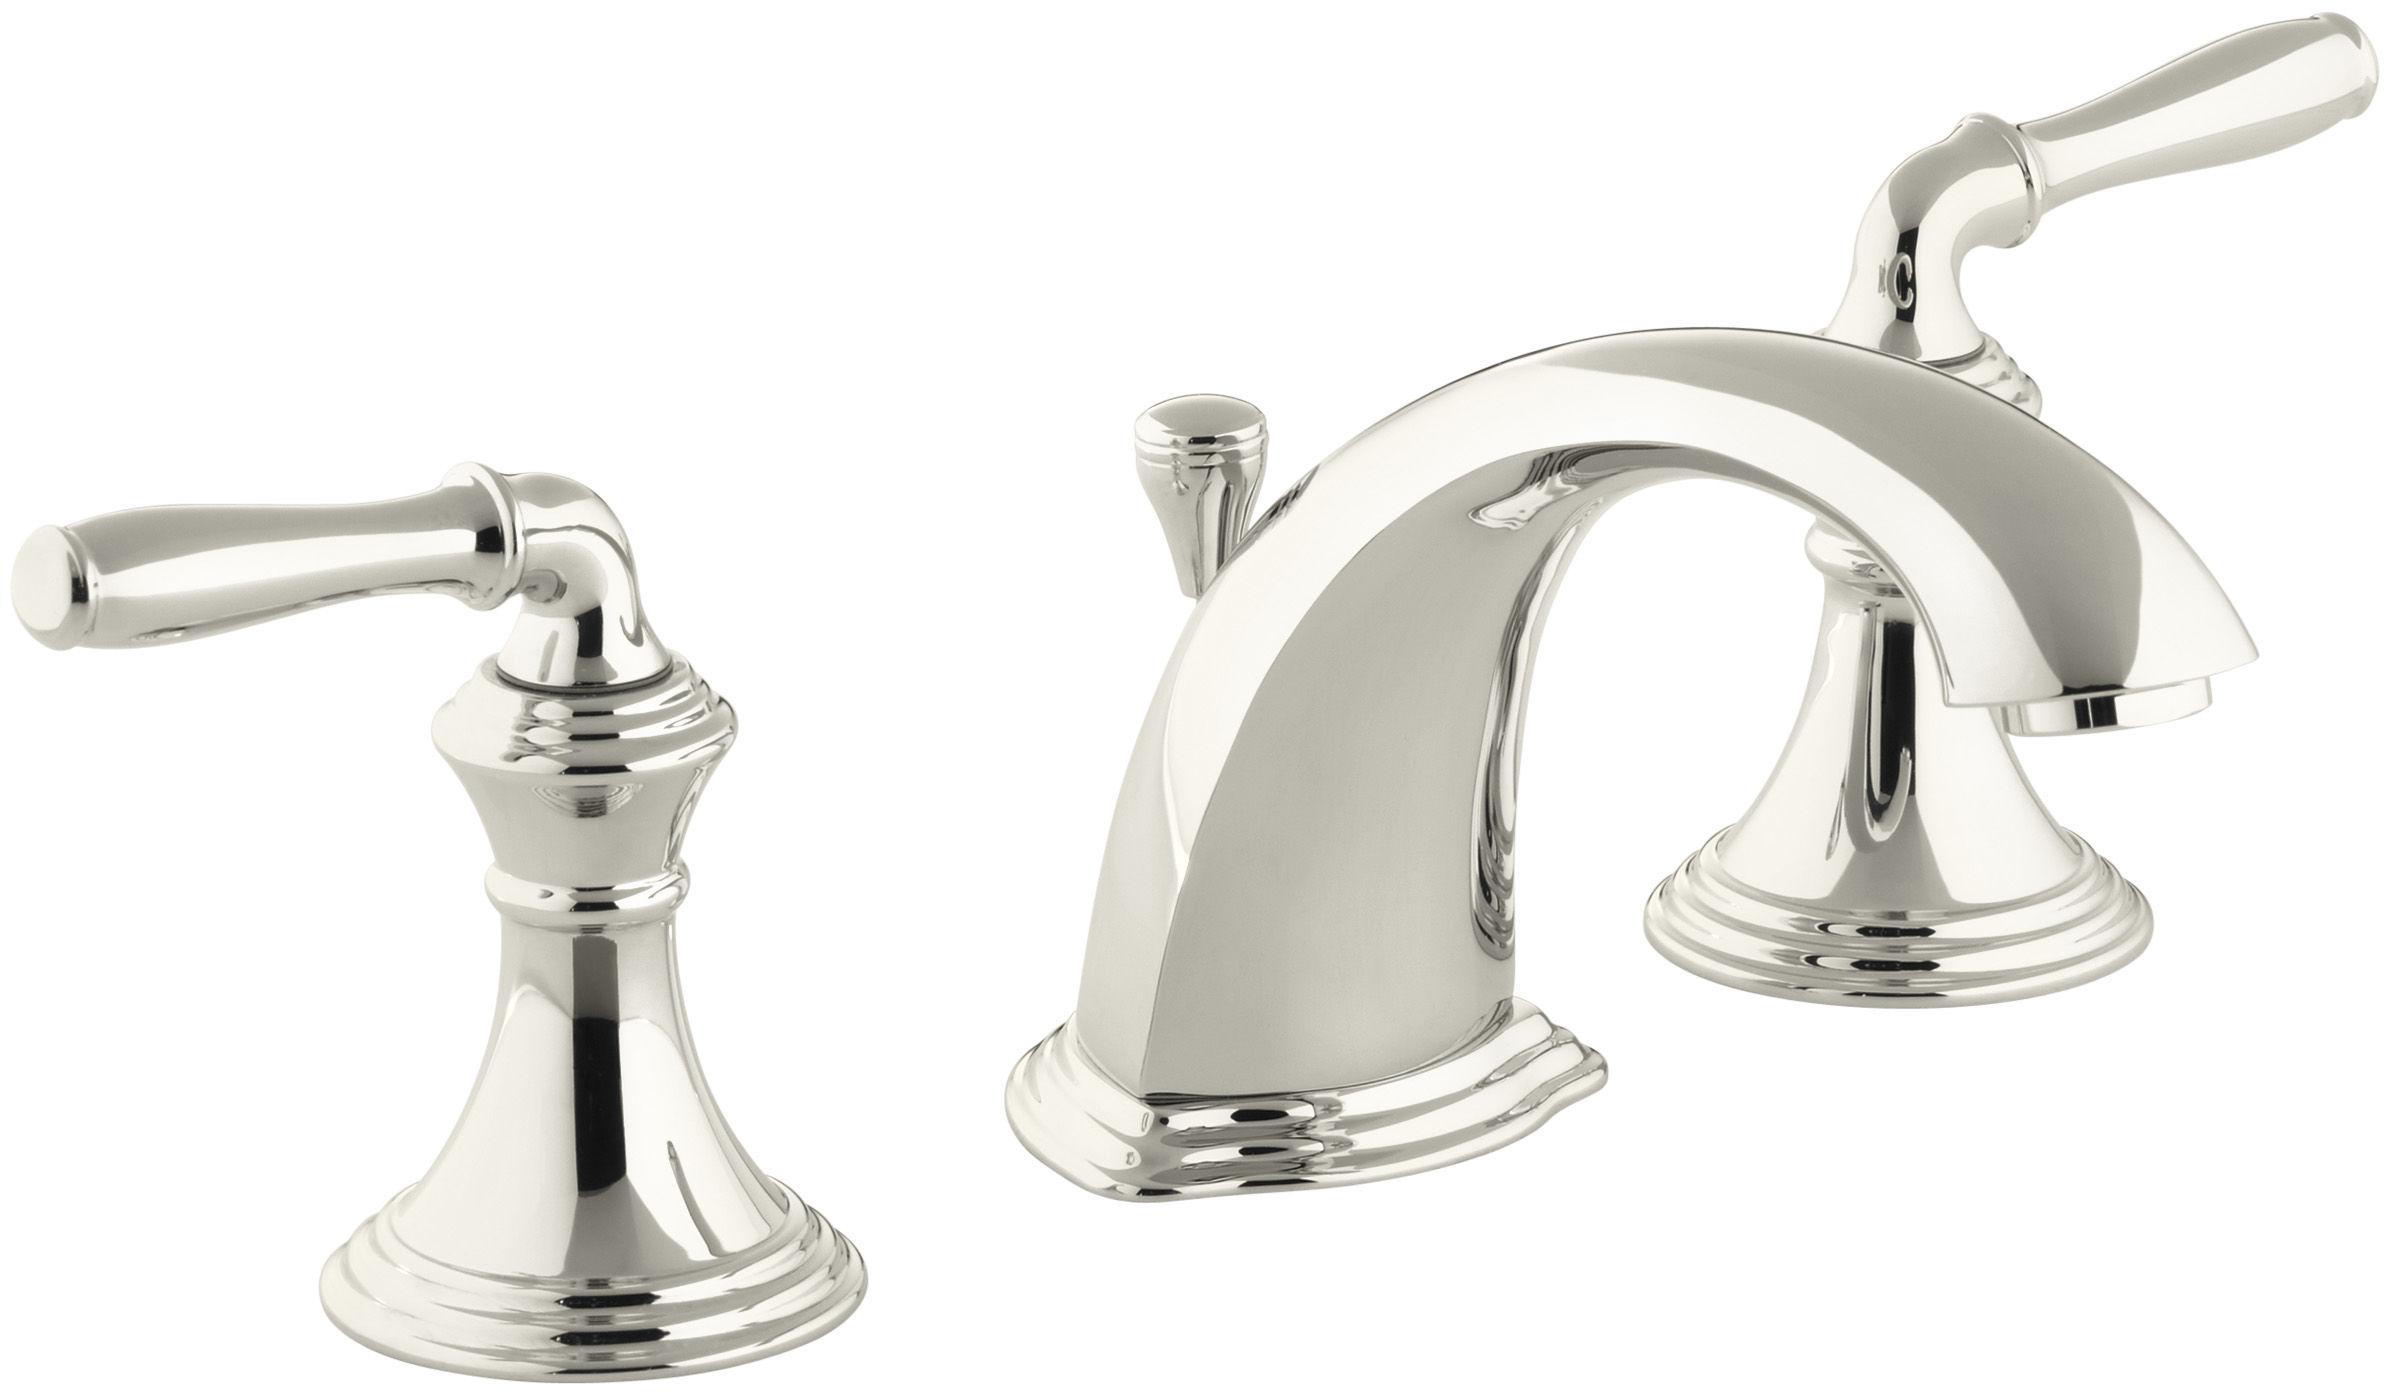 Kohler K 394 4 Sn Vibrant Polished Nickel Devonshire Widespread Bathroom Faucet With Ultraglide Valve And Quick Mount Technology Free Metal Pop Up Drain